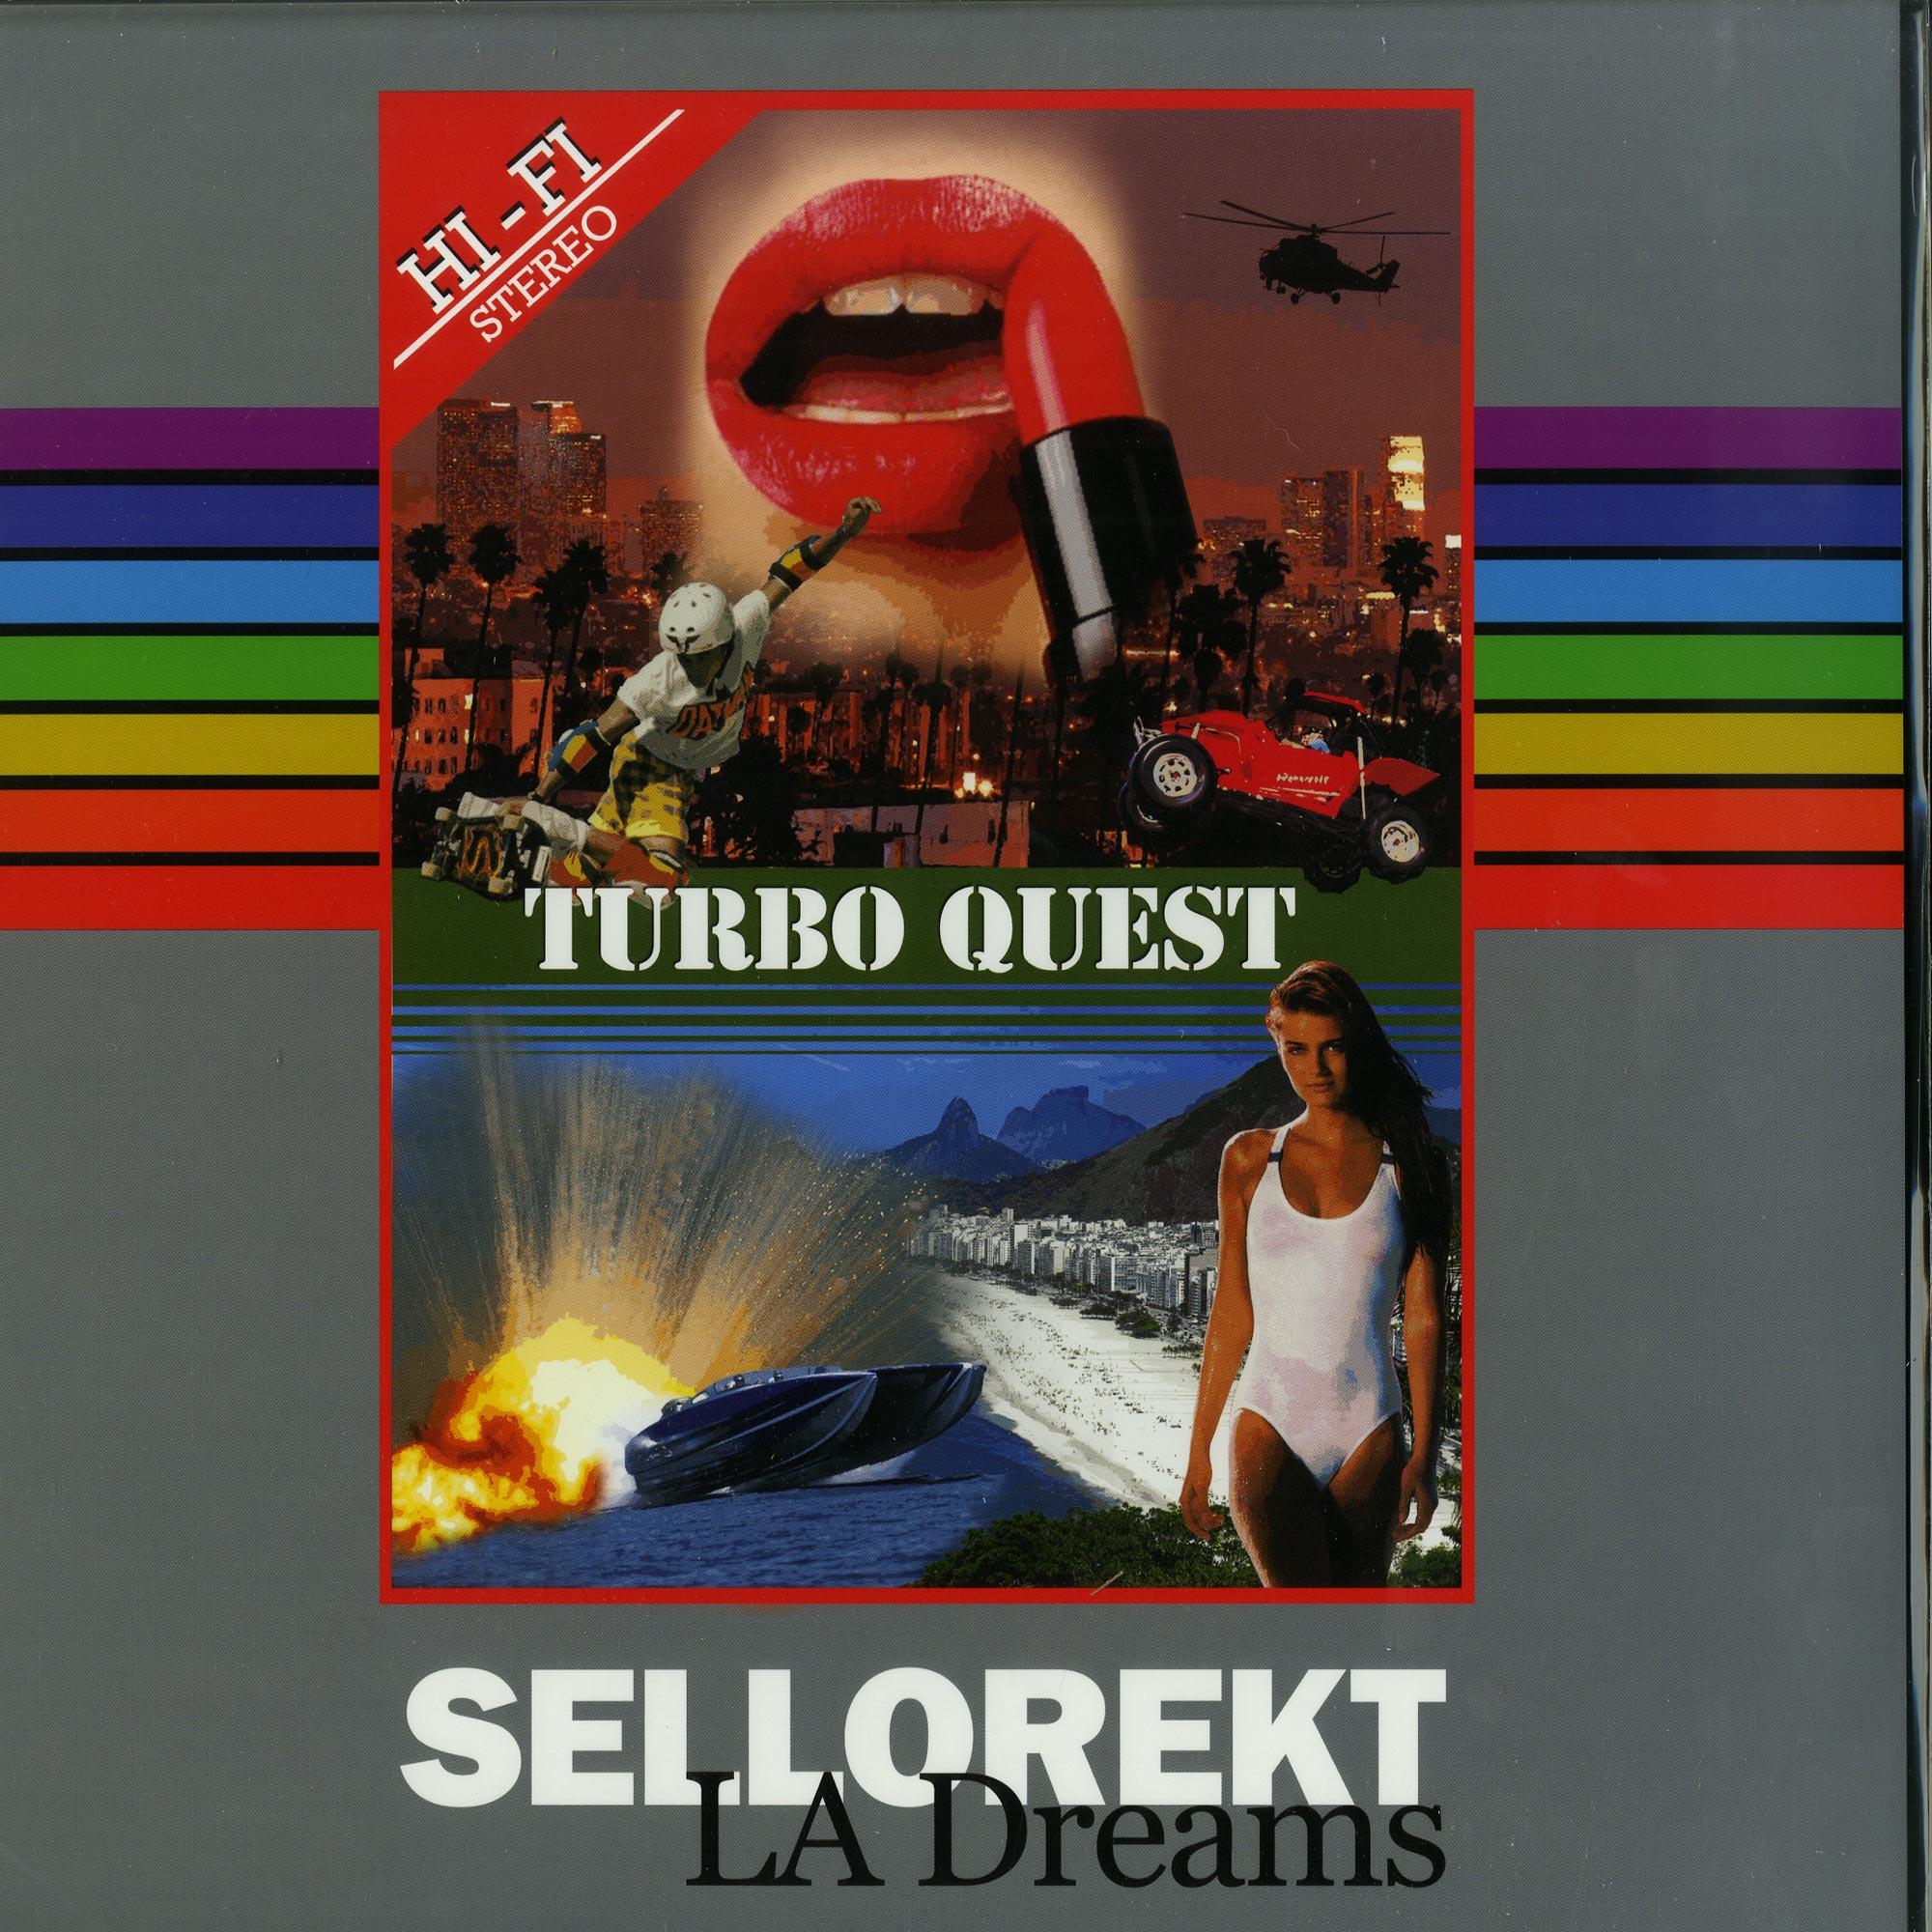 Sellorket / LA Dreams - TURBO QUEST EP